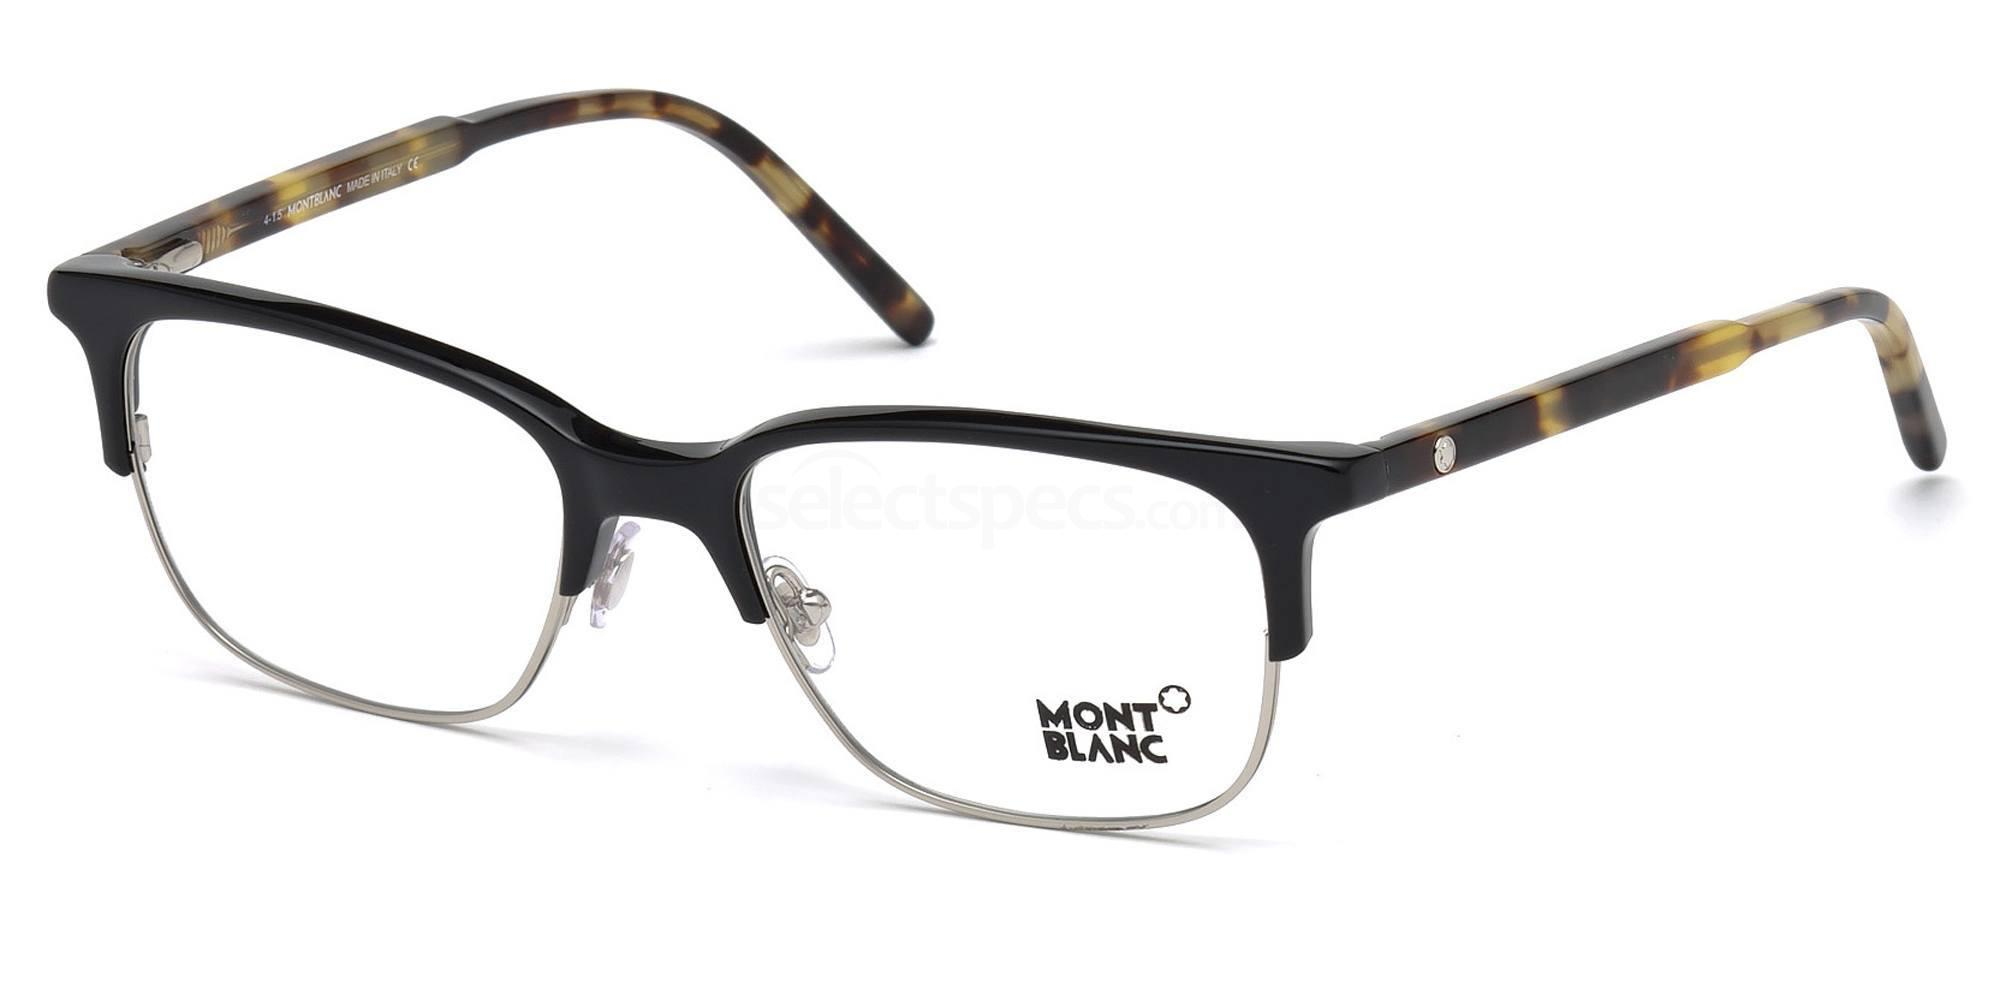 005 MB0552 Glasses, Mont Blanc